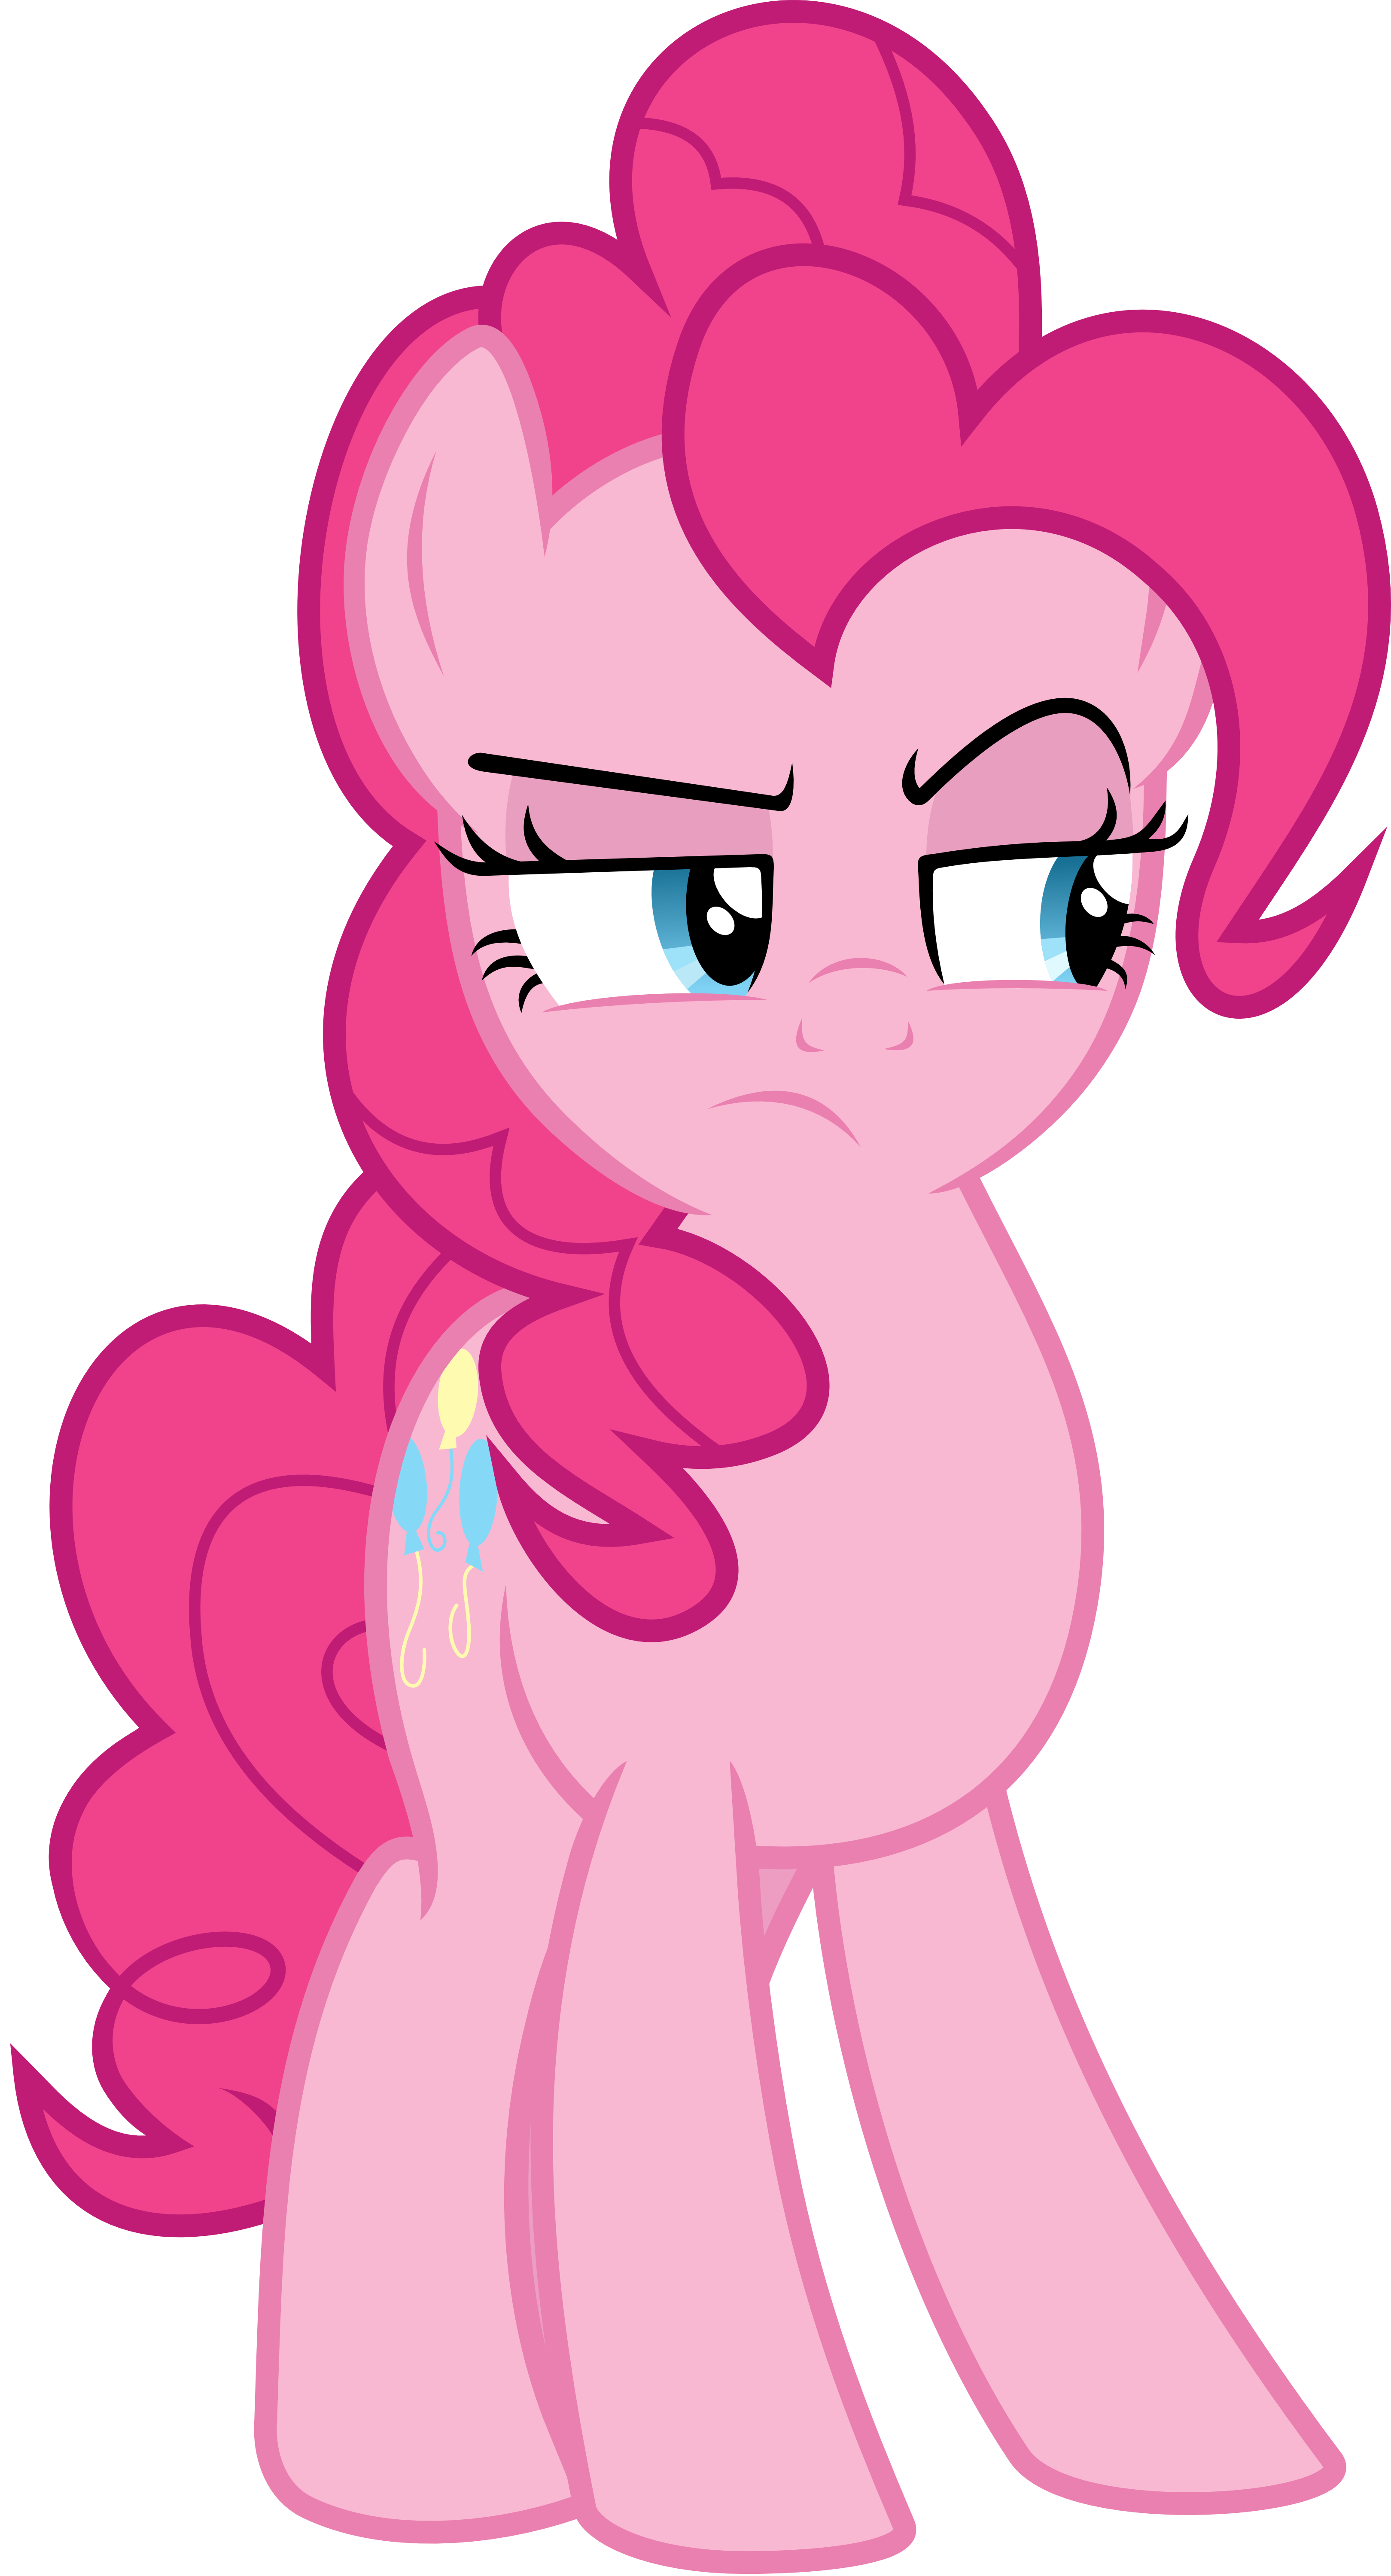 Suspicious Pinkie